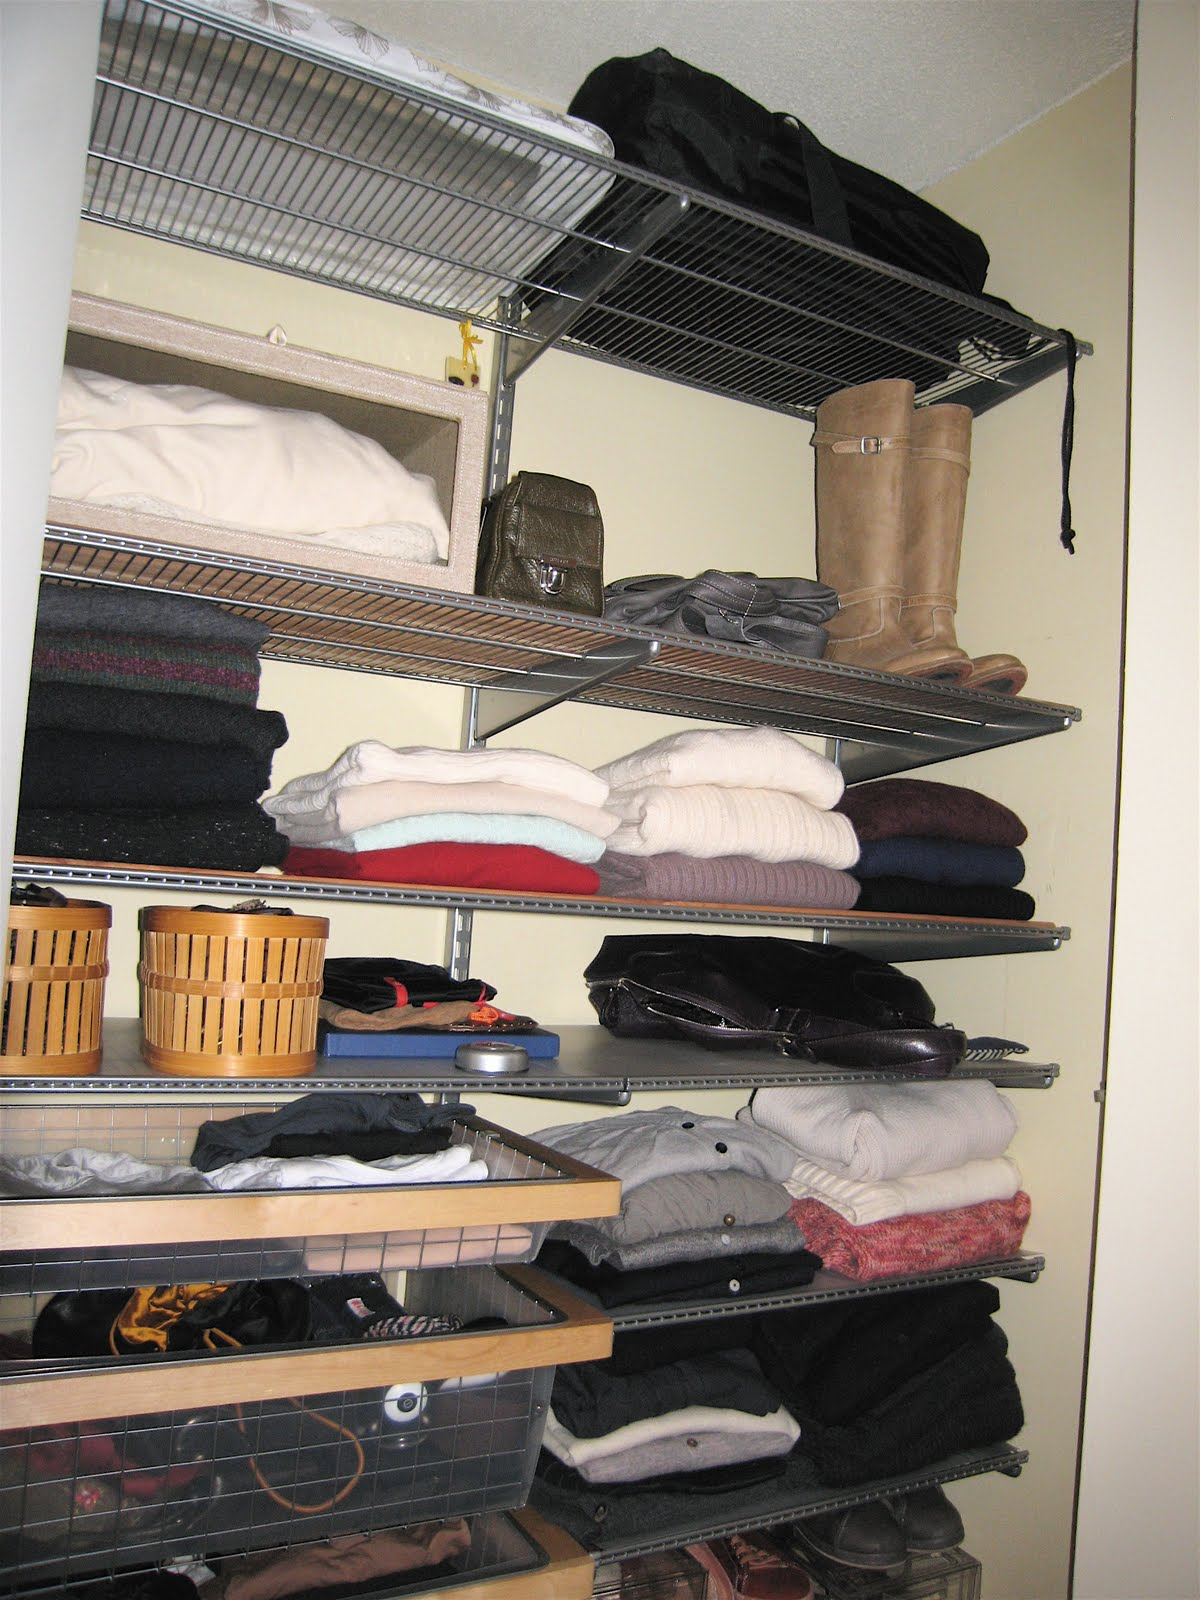 standing storage shelving it ideas keep a organization linen organize elfa closets closet and free organized systems